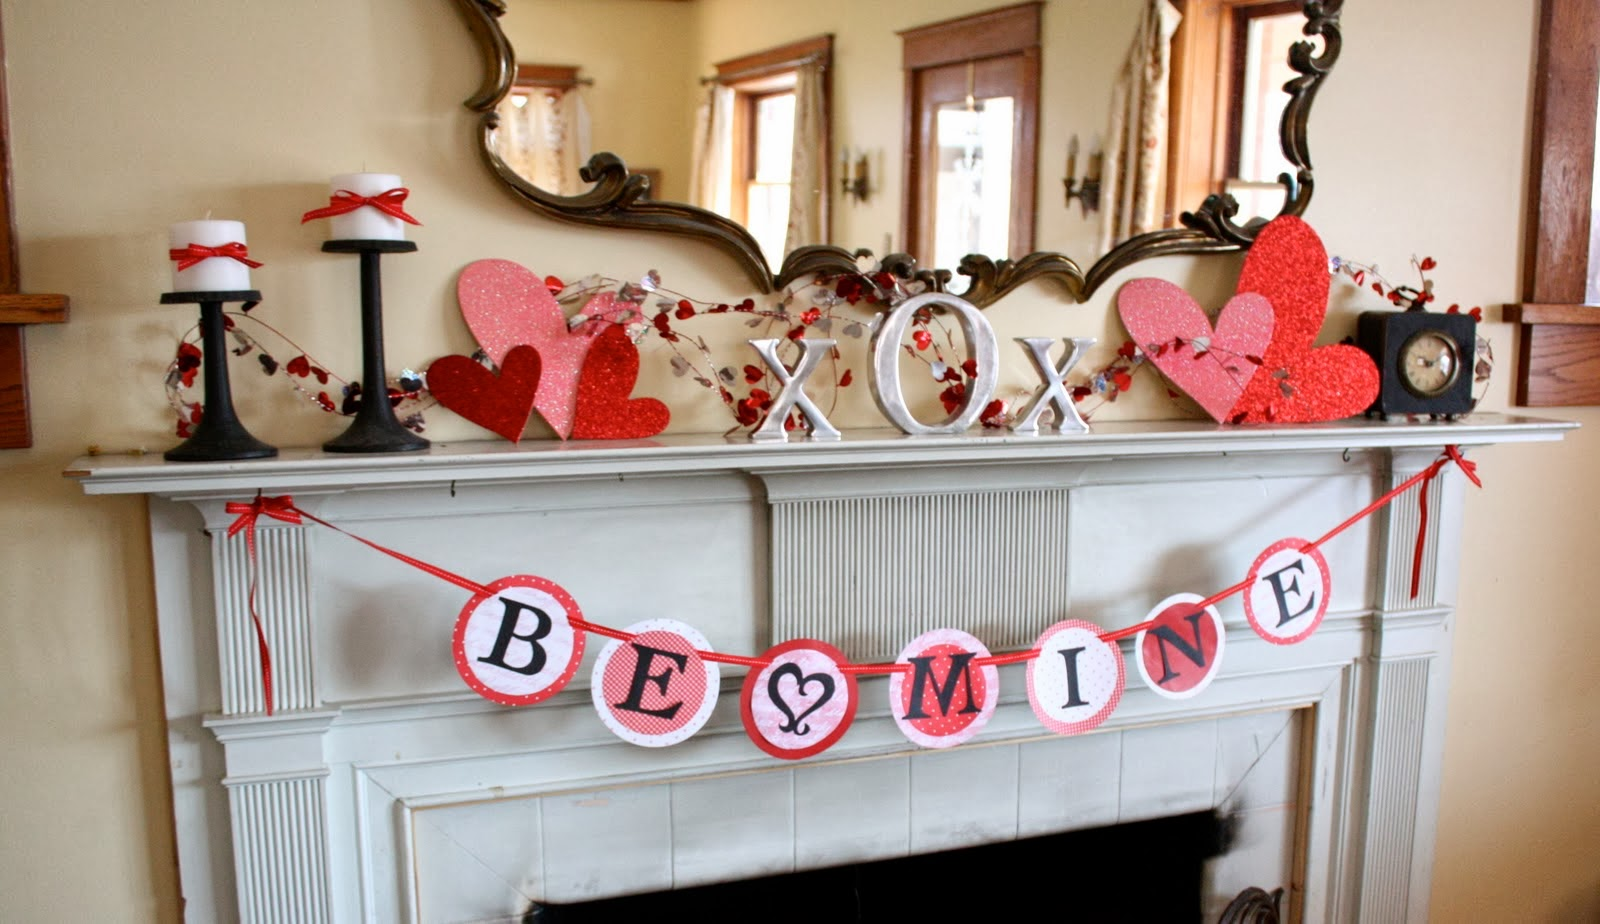 Dekorasi rumah bertema valentine rumah idamanku for Modern day home decor